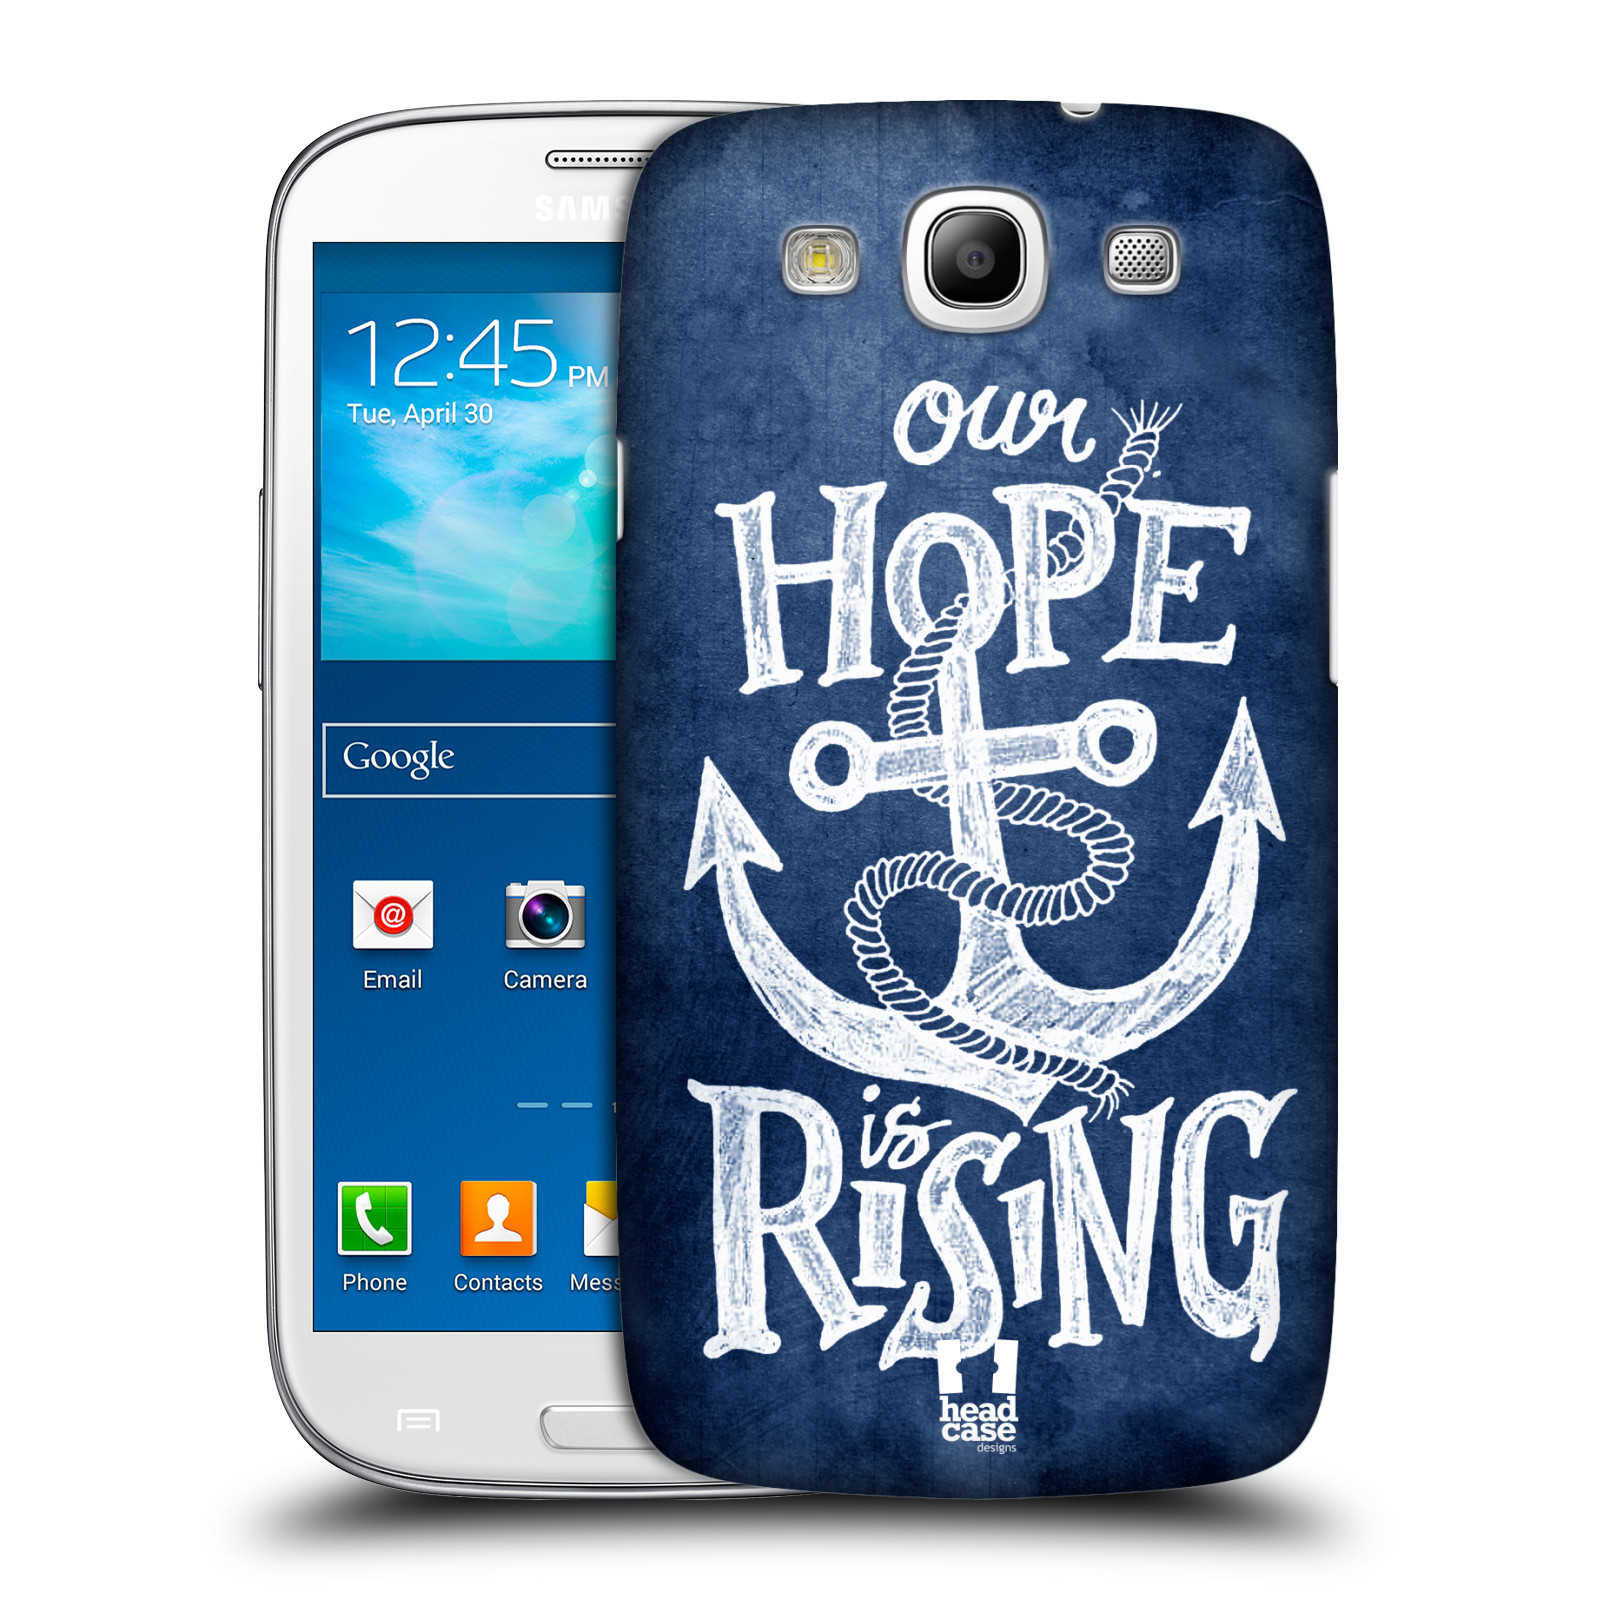 Plastové pouzdro na mobil Samsung Galaxy S III HEAD CASE KOTVA RISING